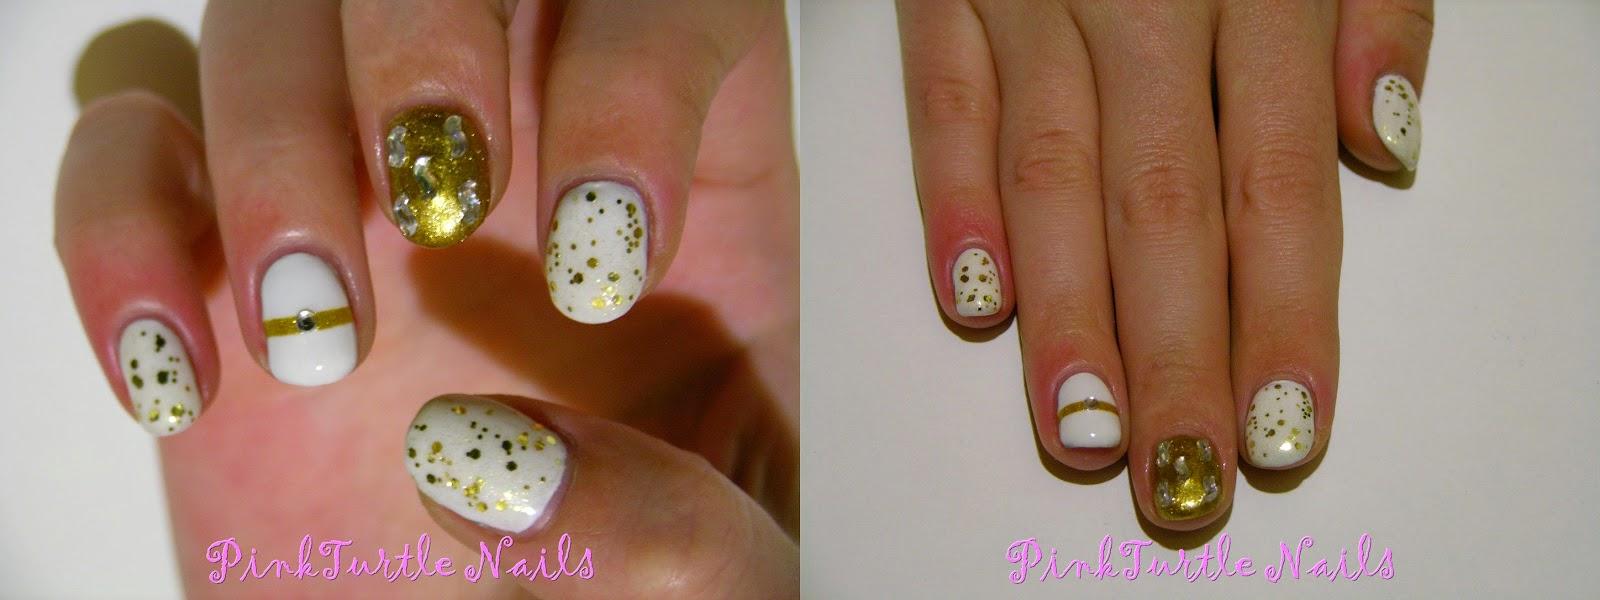 http://pinkturtlenails.blogspot.com.es/2015/03/reto-31-dias-pelicula.html